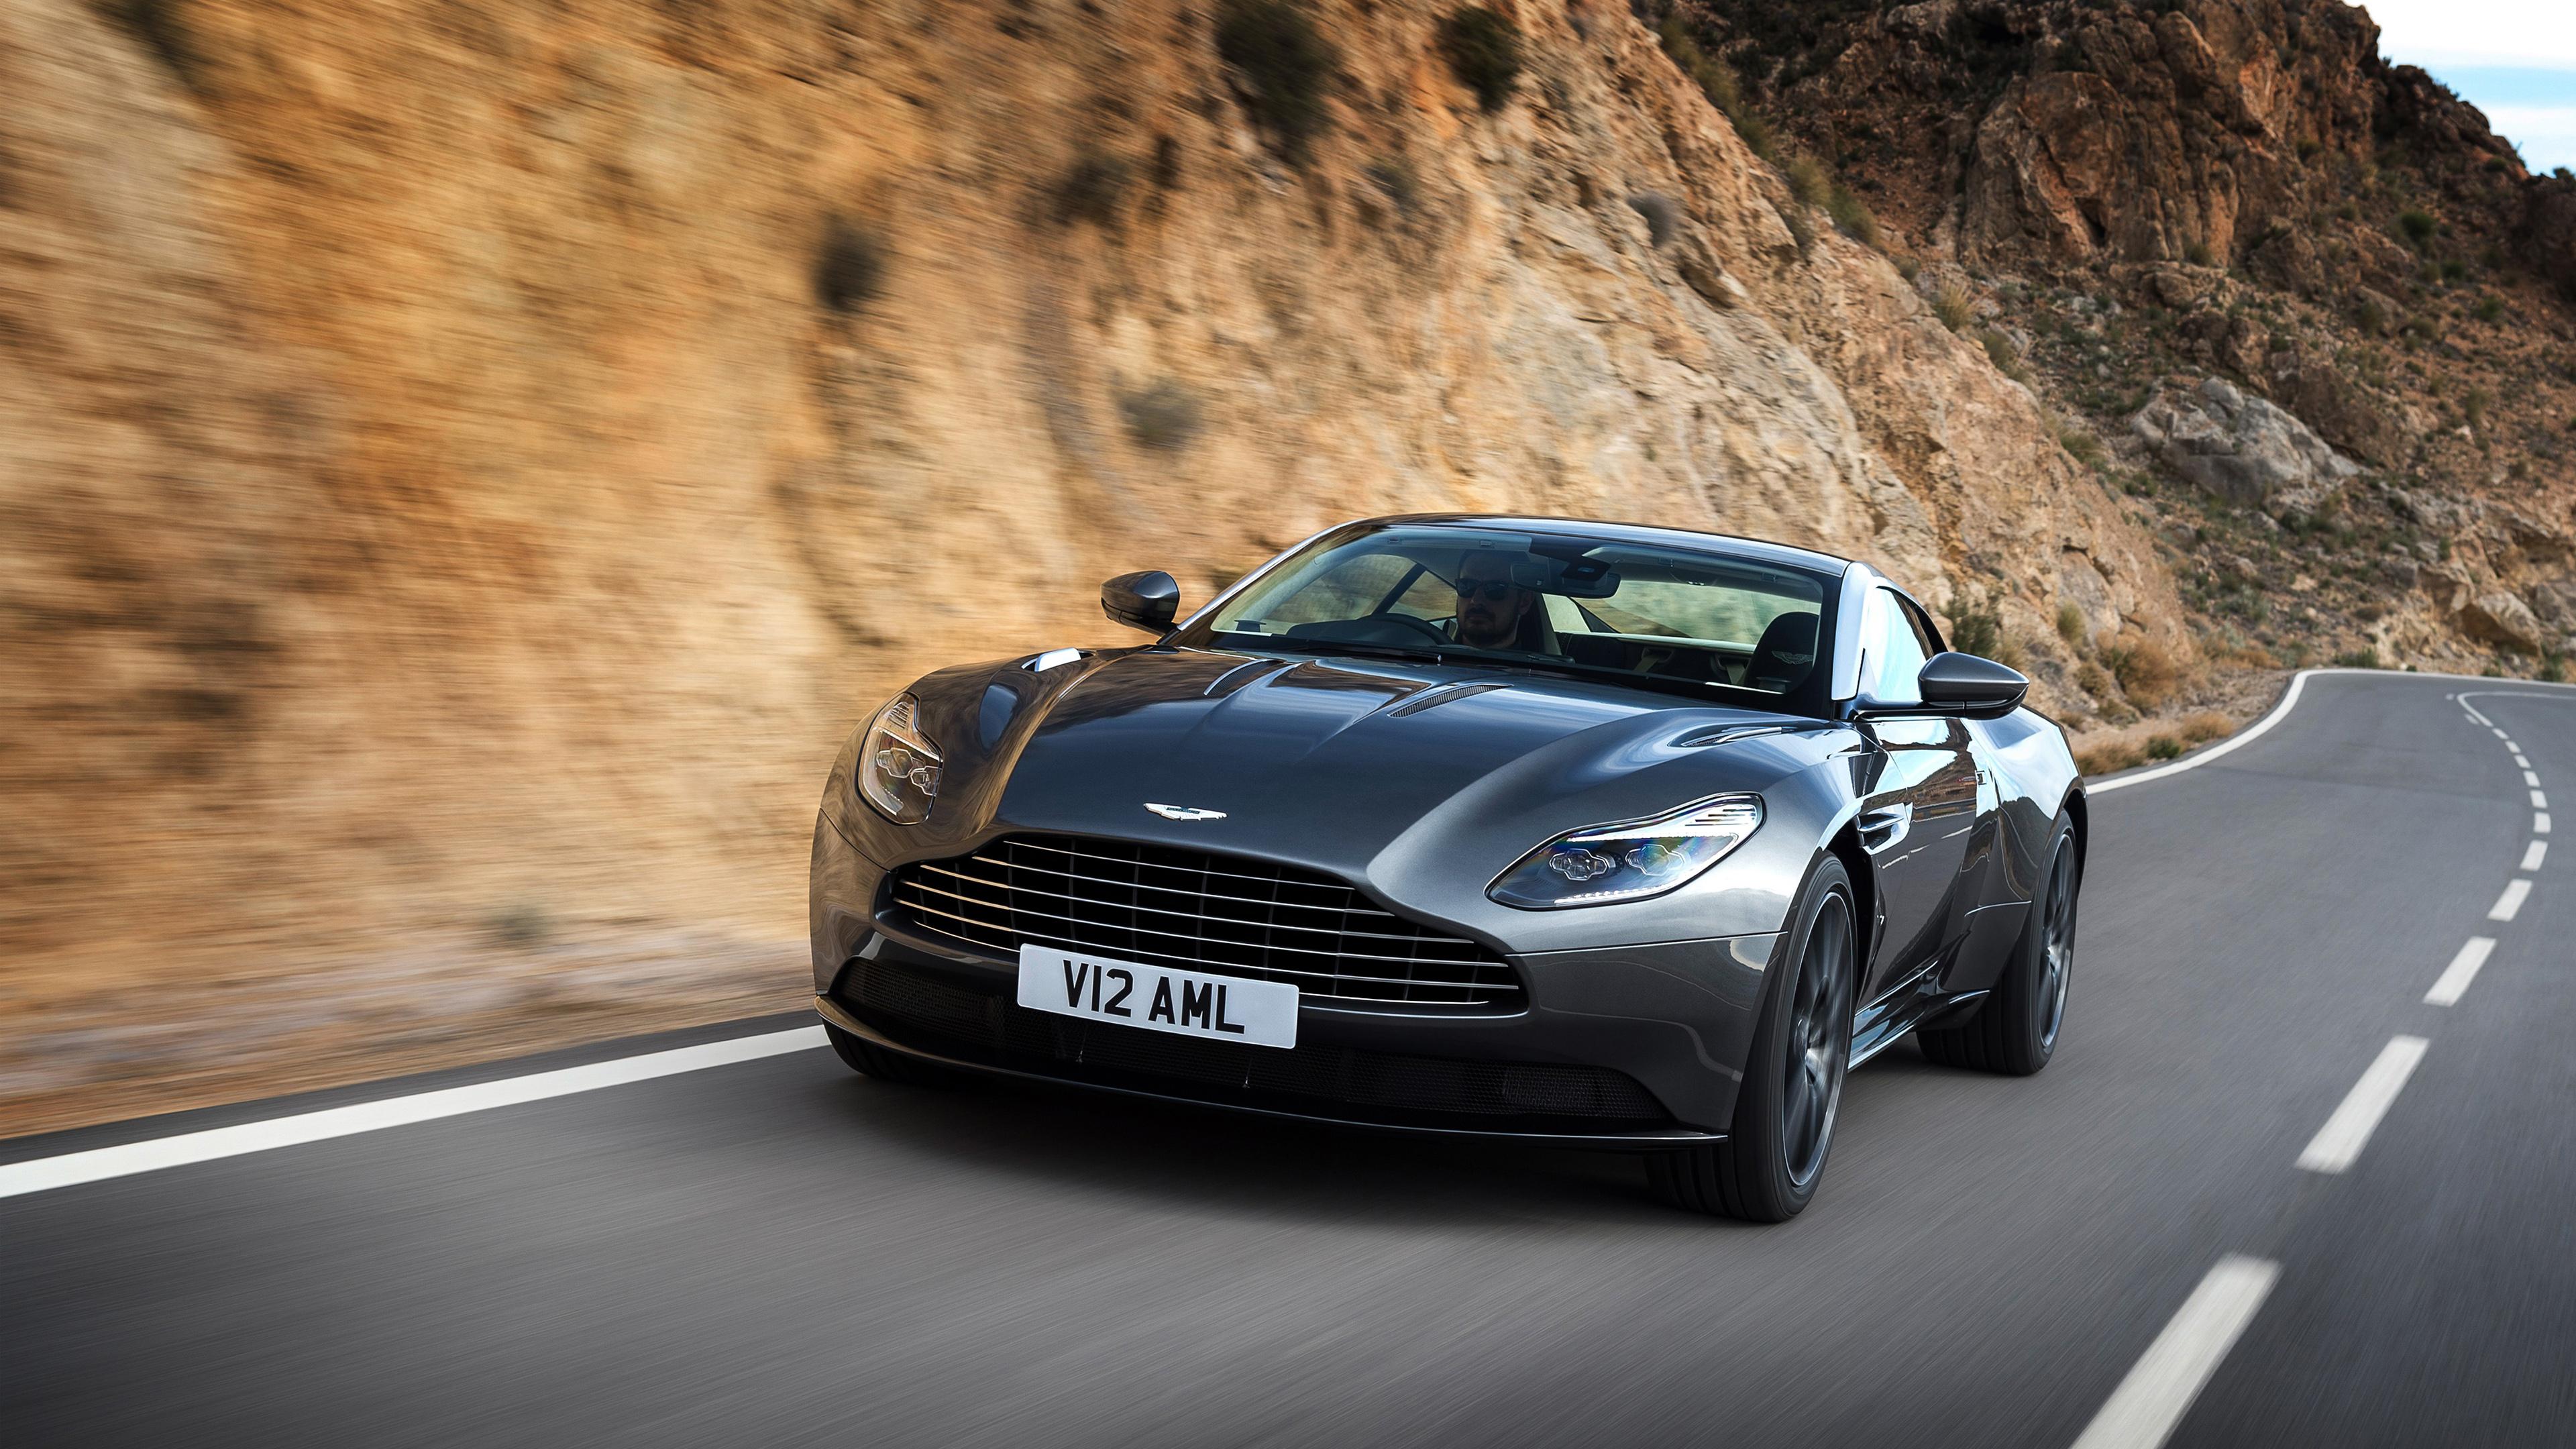 Aston martin db11 geneva auto HD wallpapers   WallpaperAsk 3840x2160